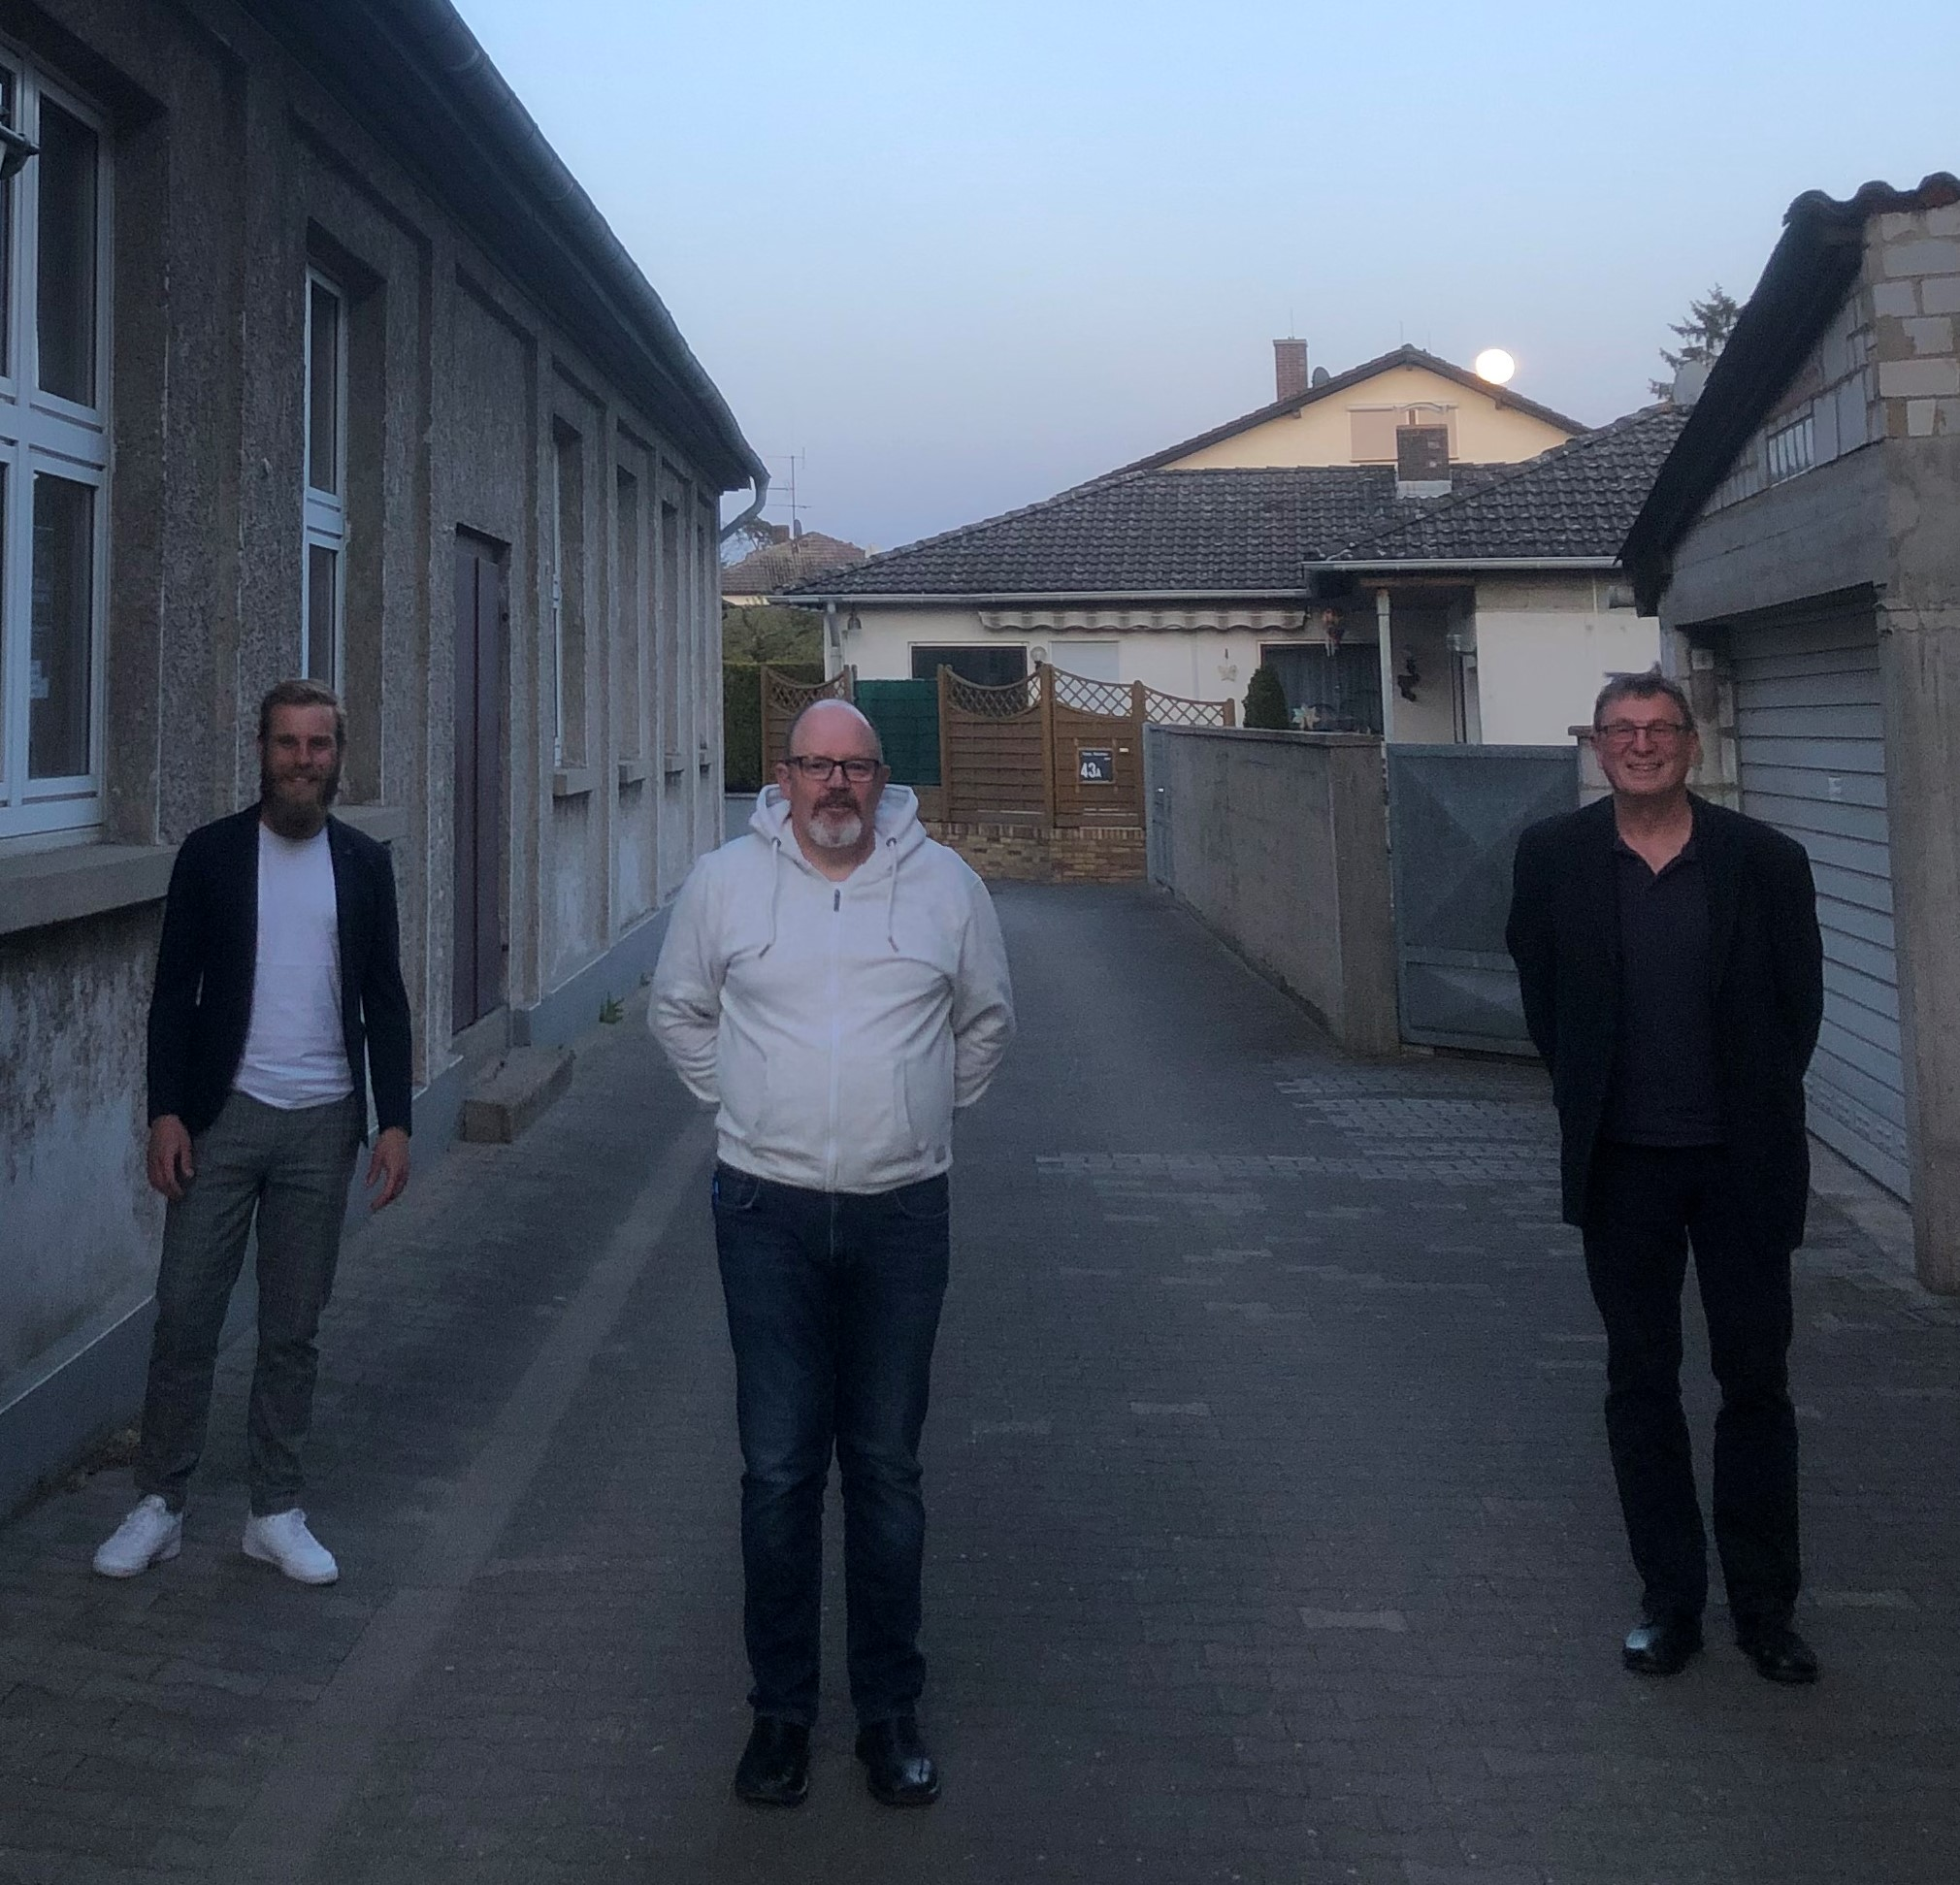 Maximilian Schimmel, Udo Stoye, Klaus Marake